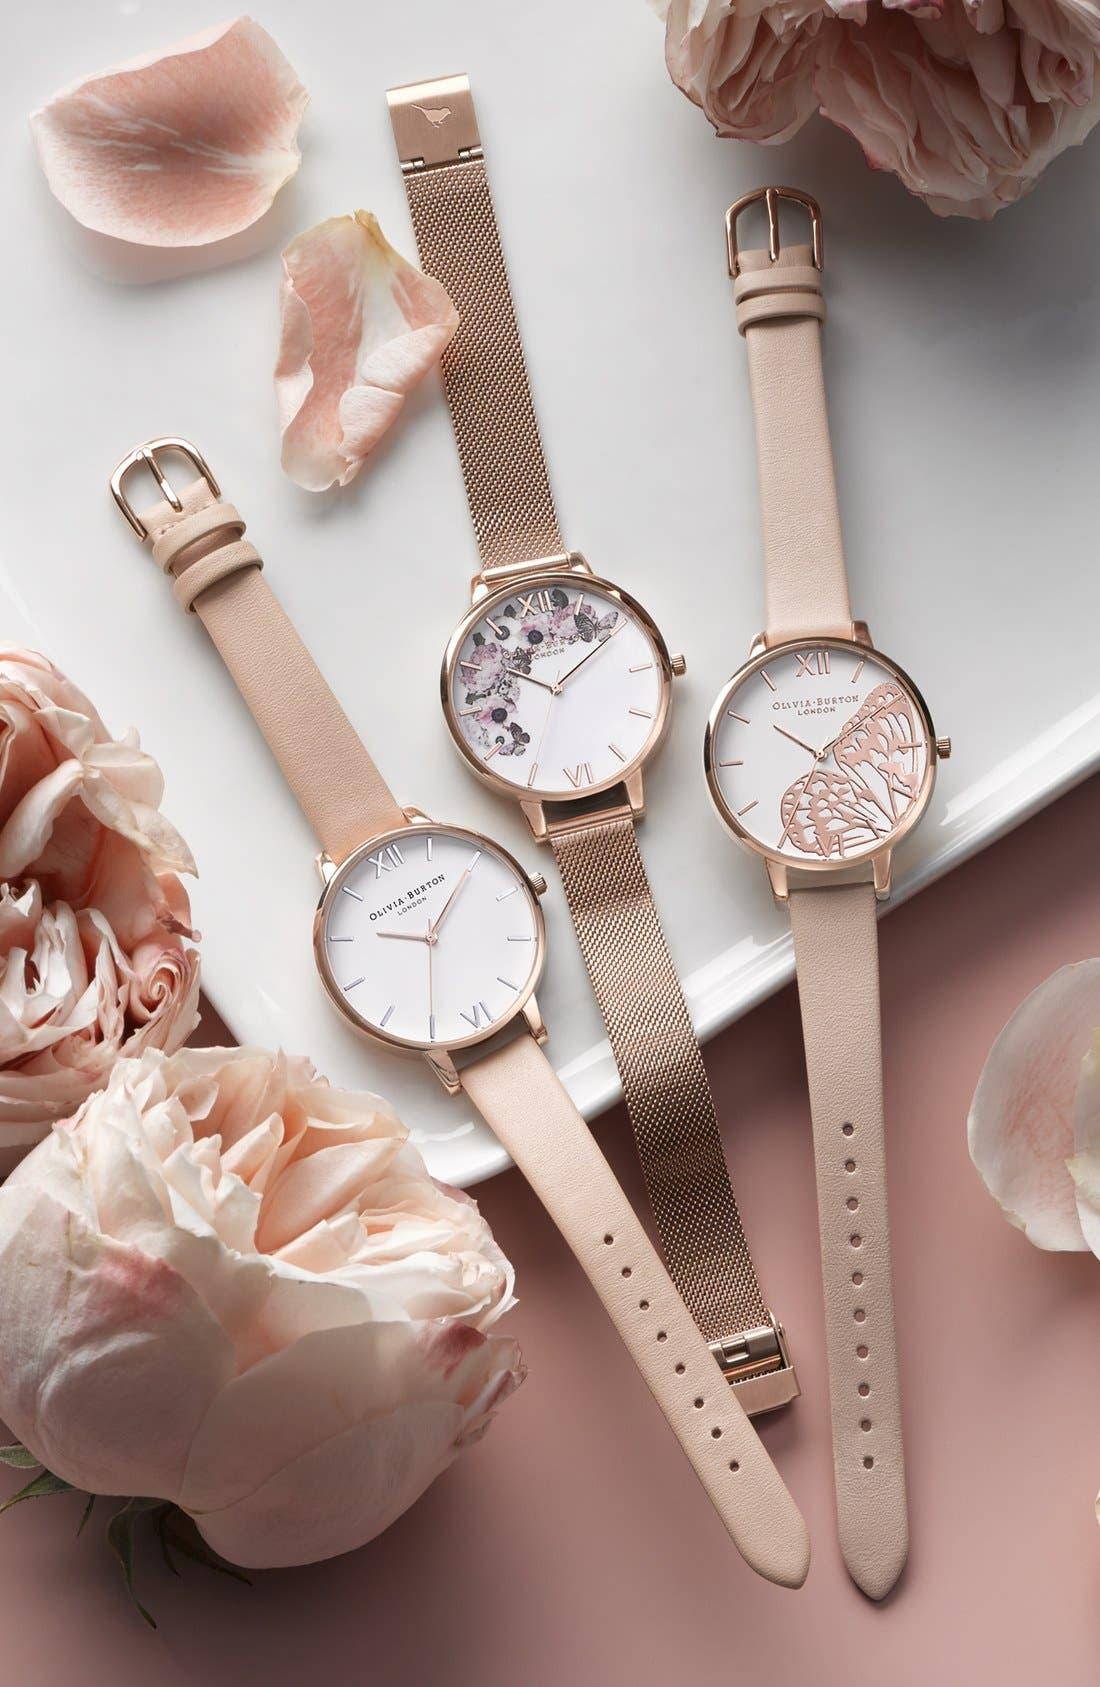 OLIVIA BURTON, Signature Florals Mesh Bracelet Watch, 38mm, Alternate thumbnail 8, color, ROSE GOLD/ ROSE GOLD/ WHITE